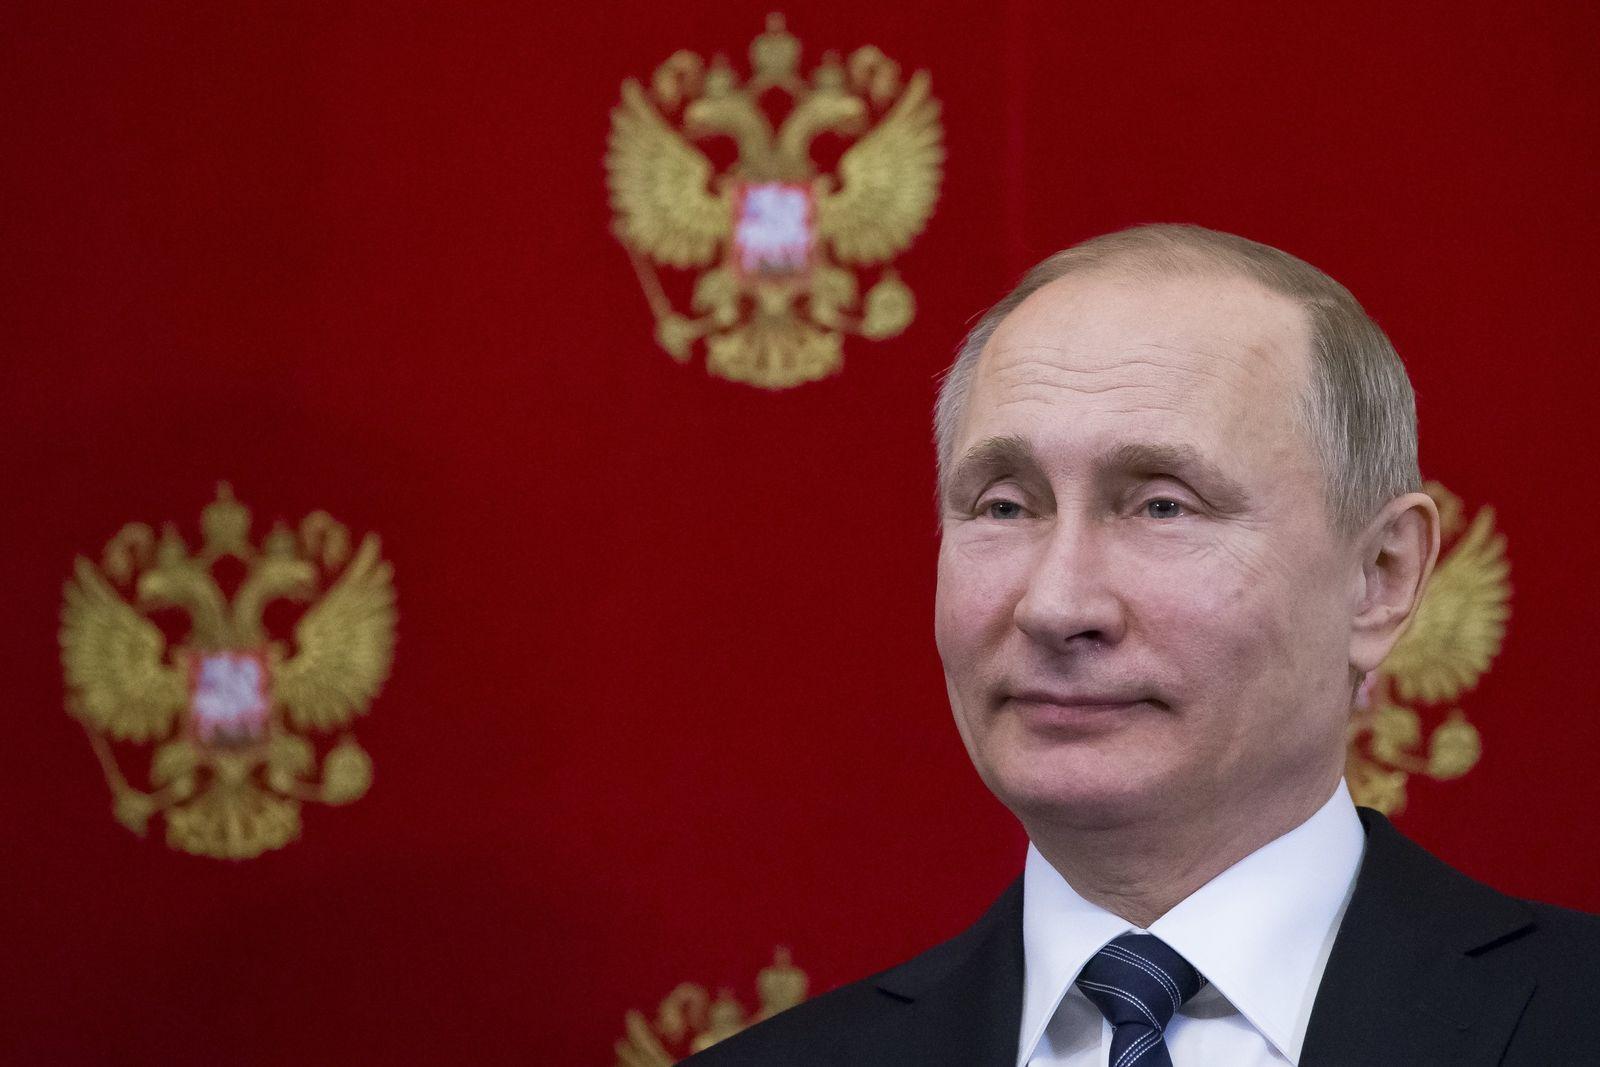 Putin/ 65. Geburtstag/ Proteste/ Wladimir Putin